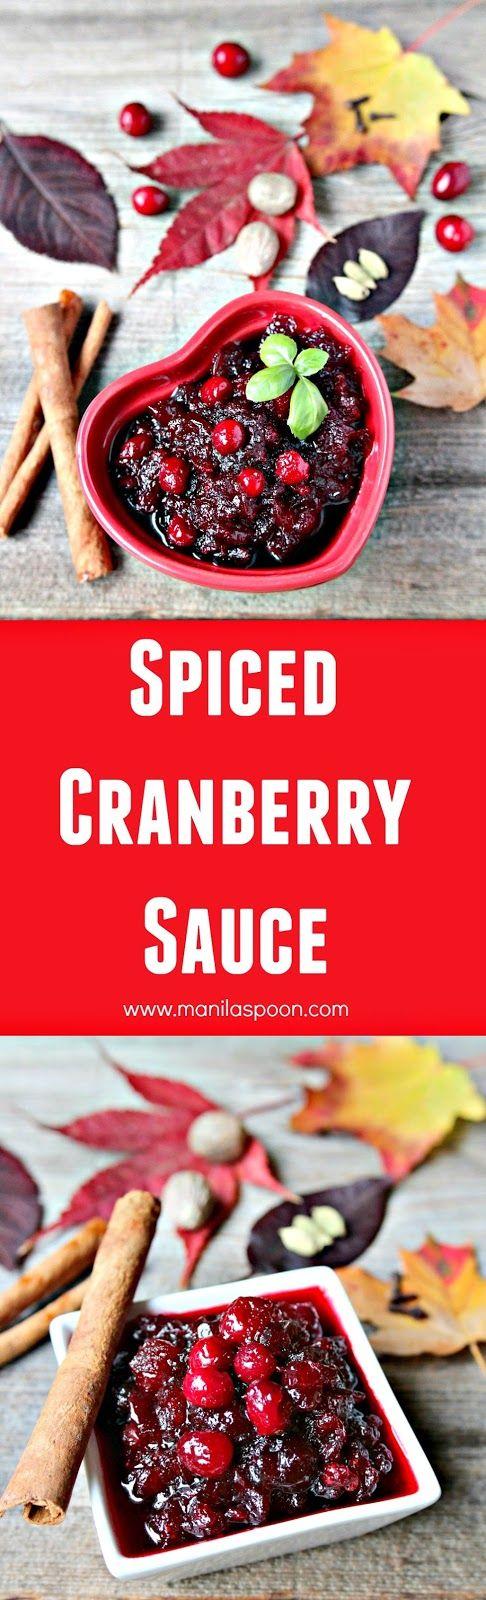 with nutmeg, cardamom, cloves and cinnamon this Spiced Cranberry Sauce ...